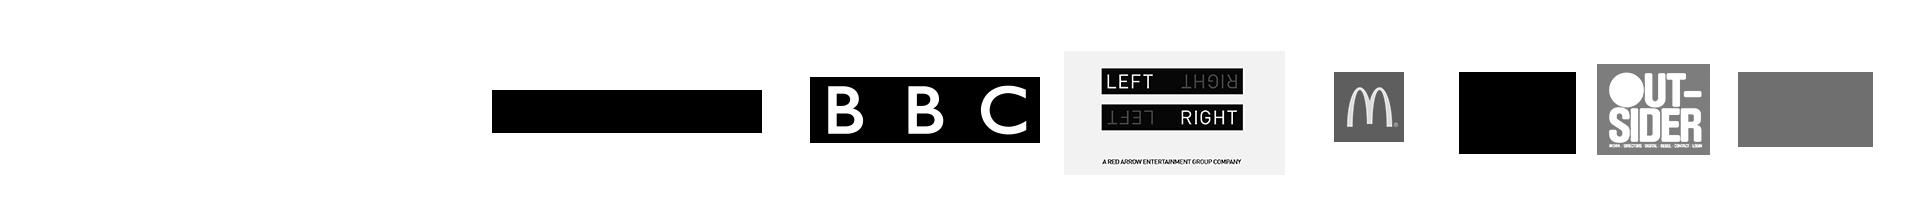 TV-PROP-BAR.png